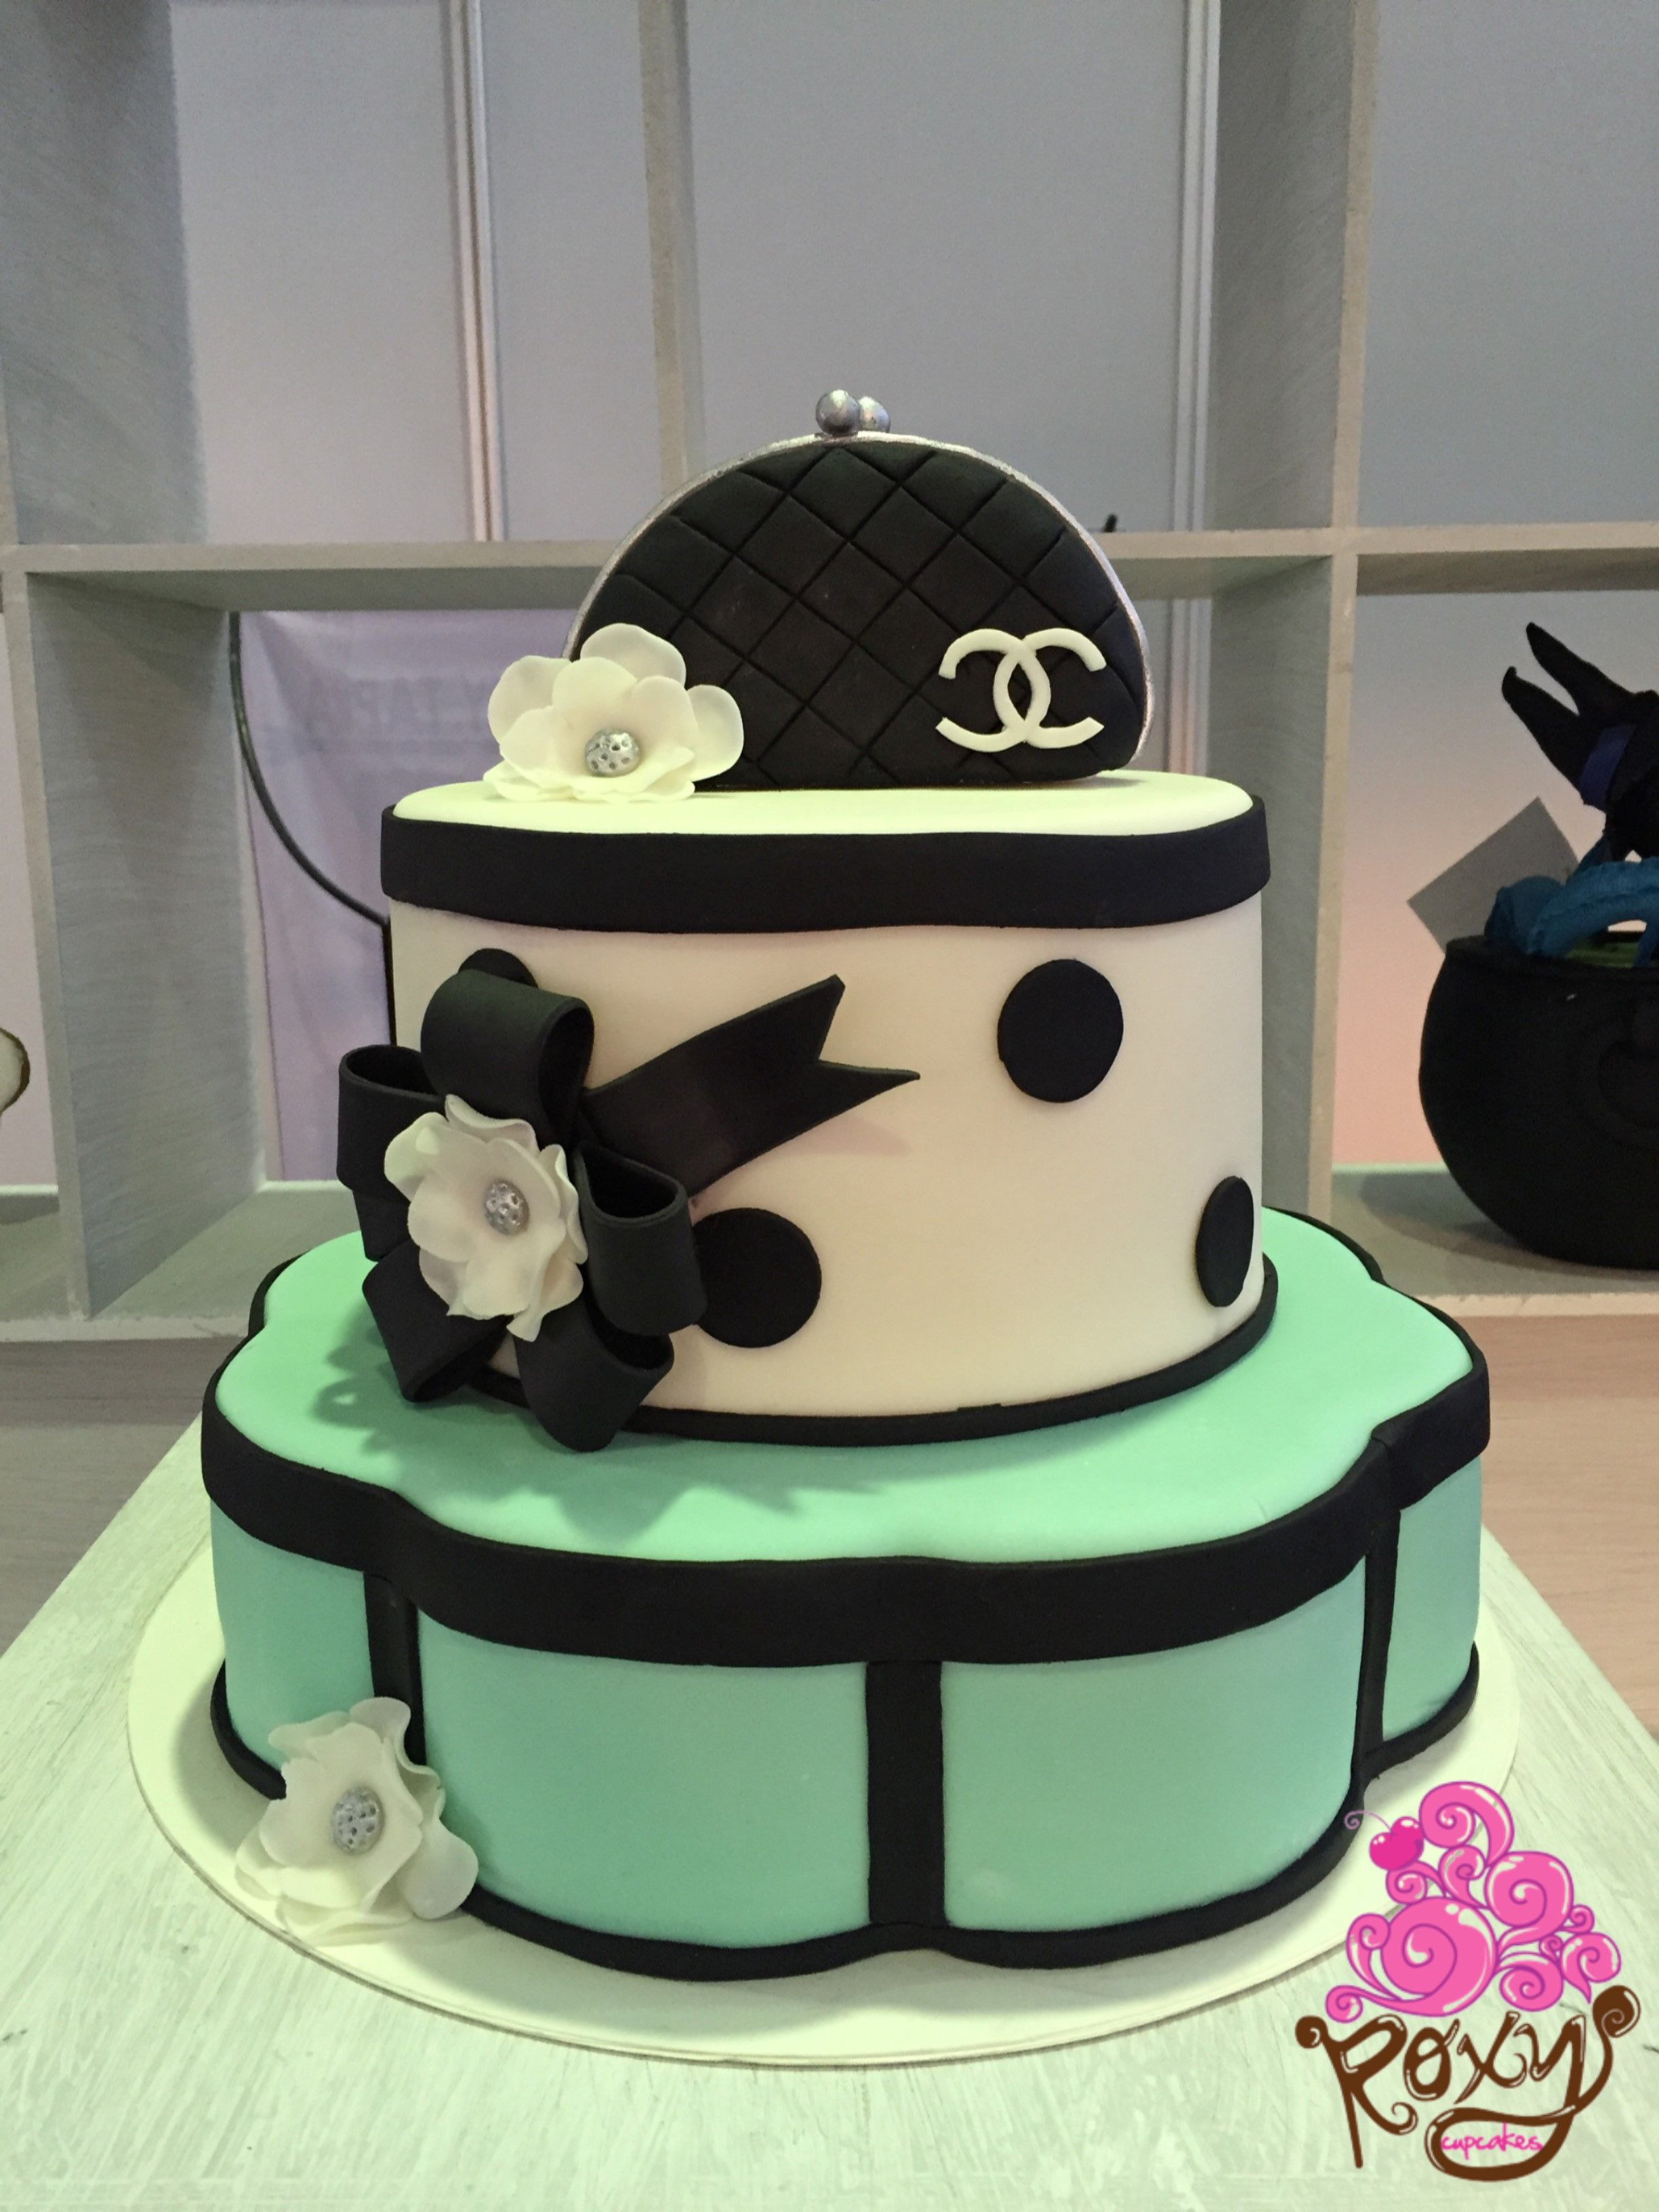 Chanel themed handbag birthday cake